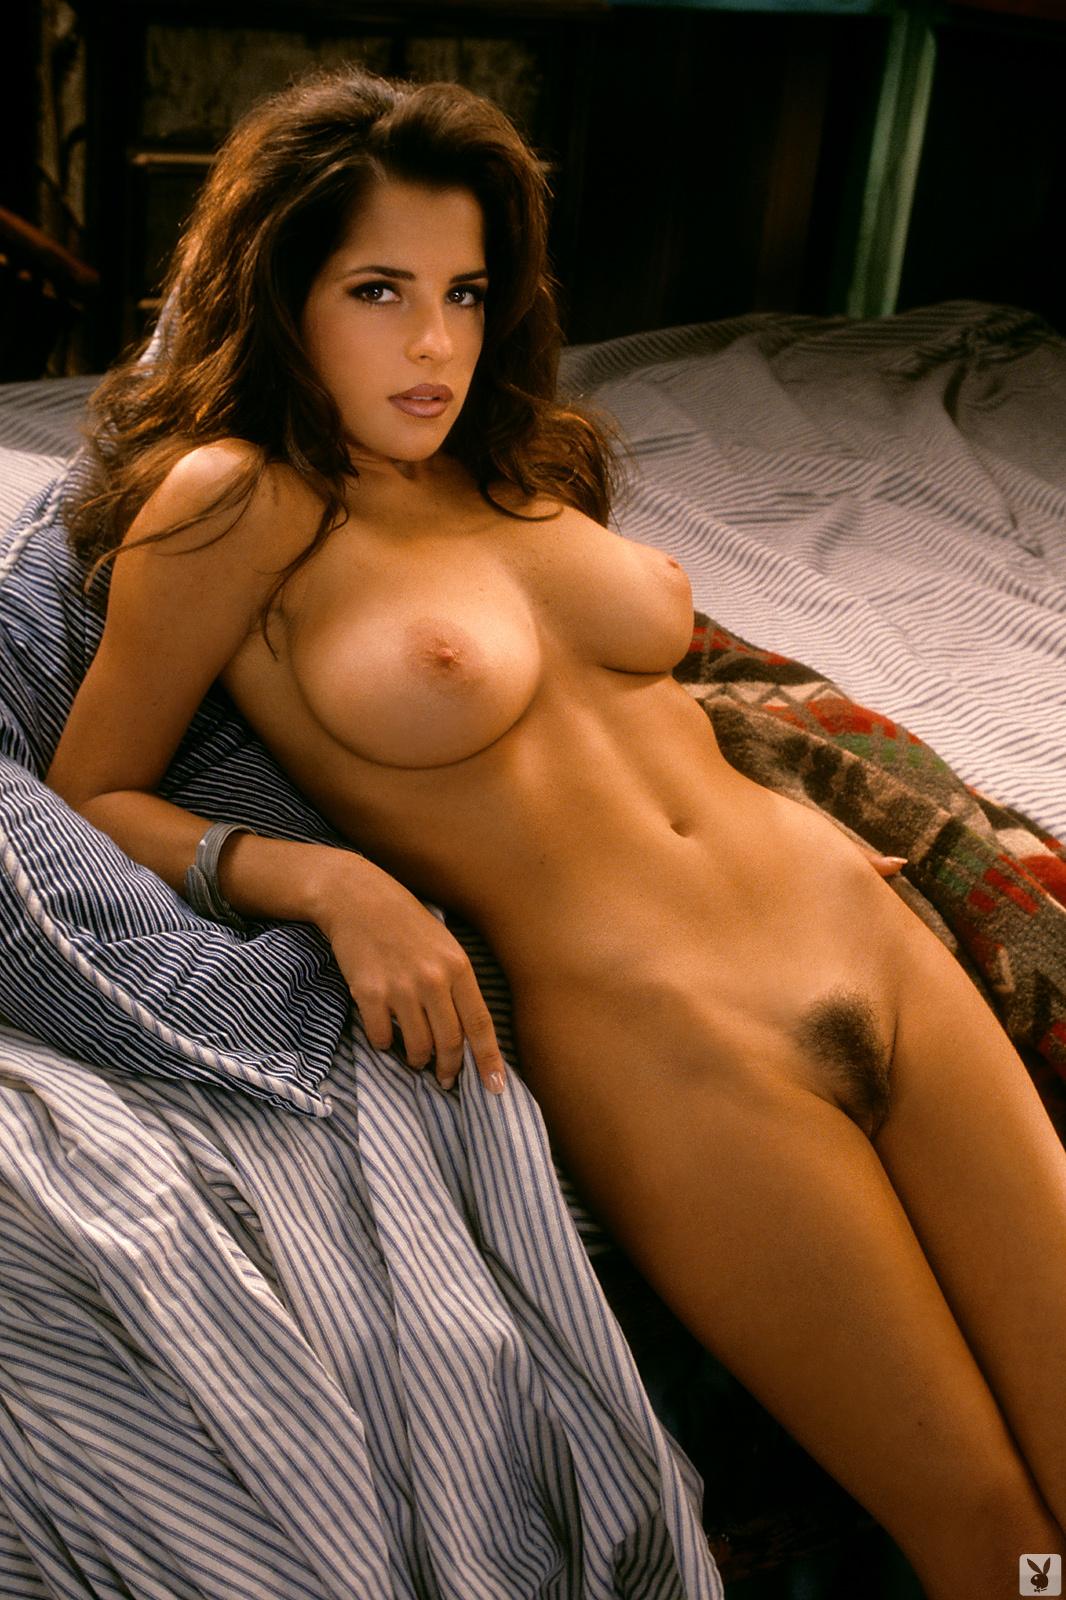 kelly-monaco-boobs-naked-playmate-april-1997-playboy-44